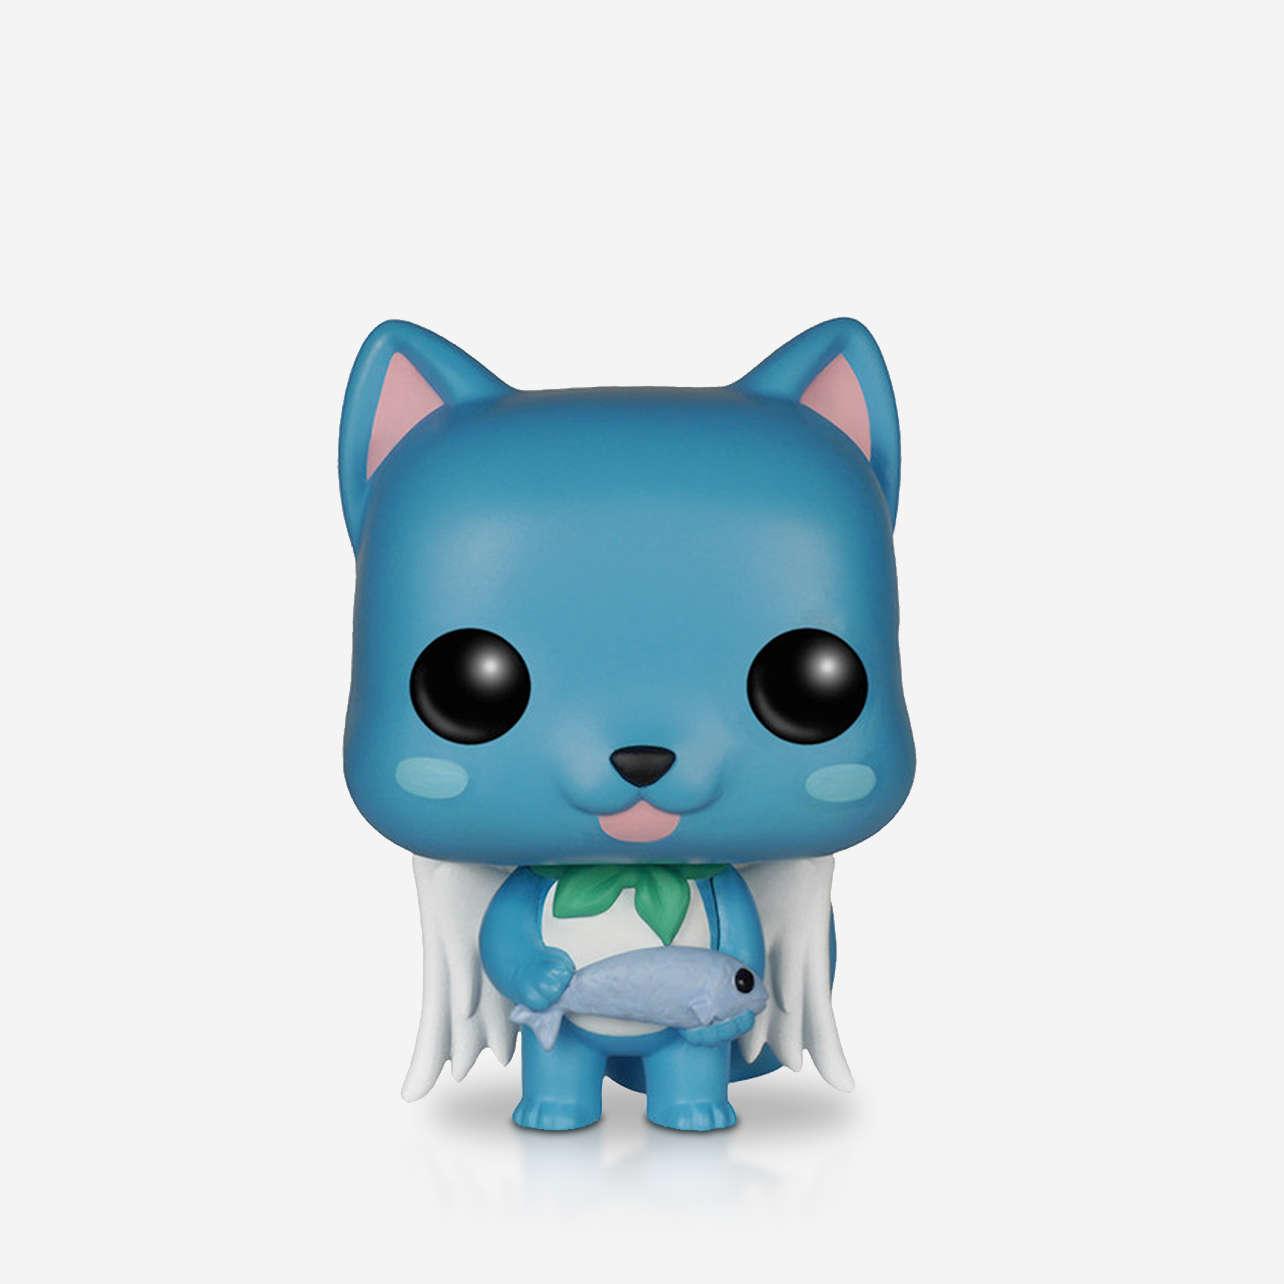 Funko Pop - Happy figures-collectibles